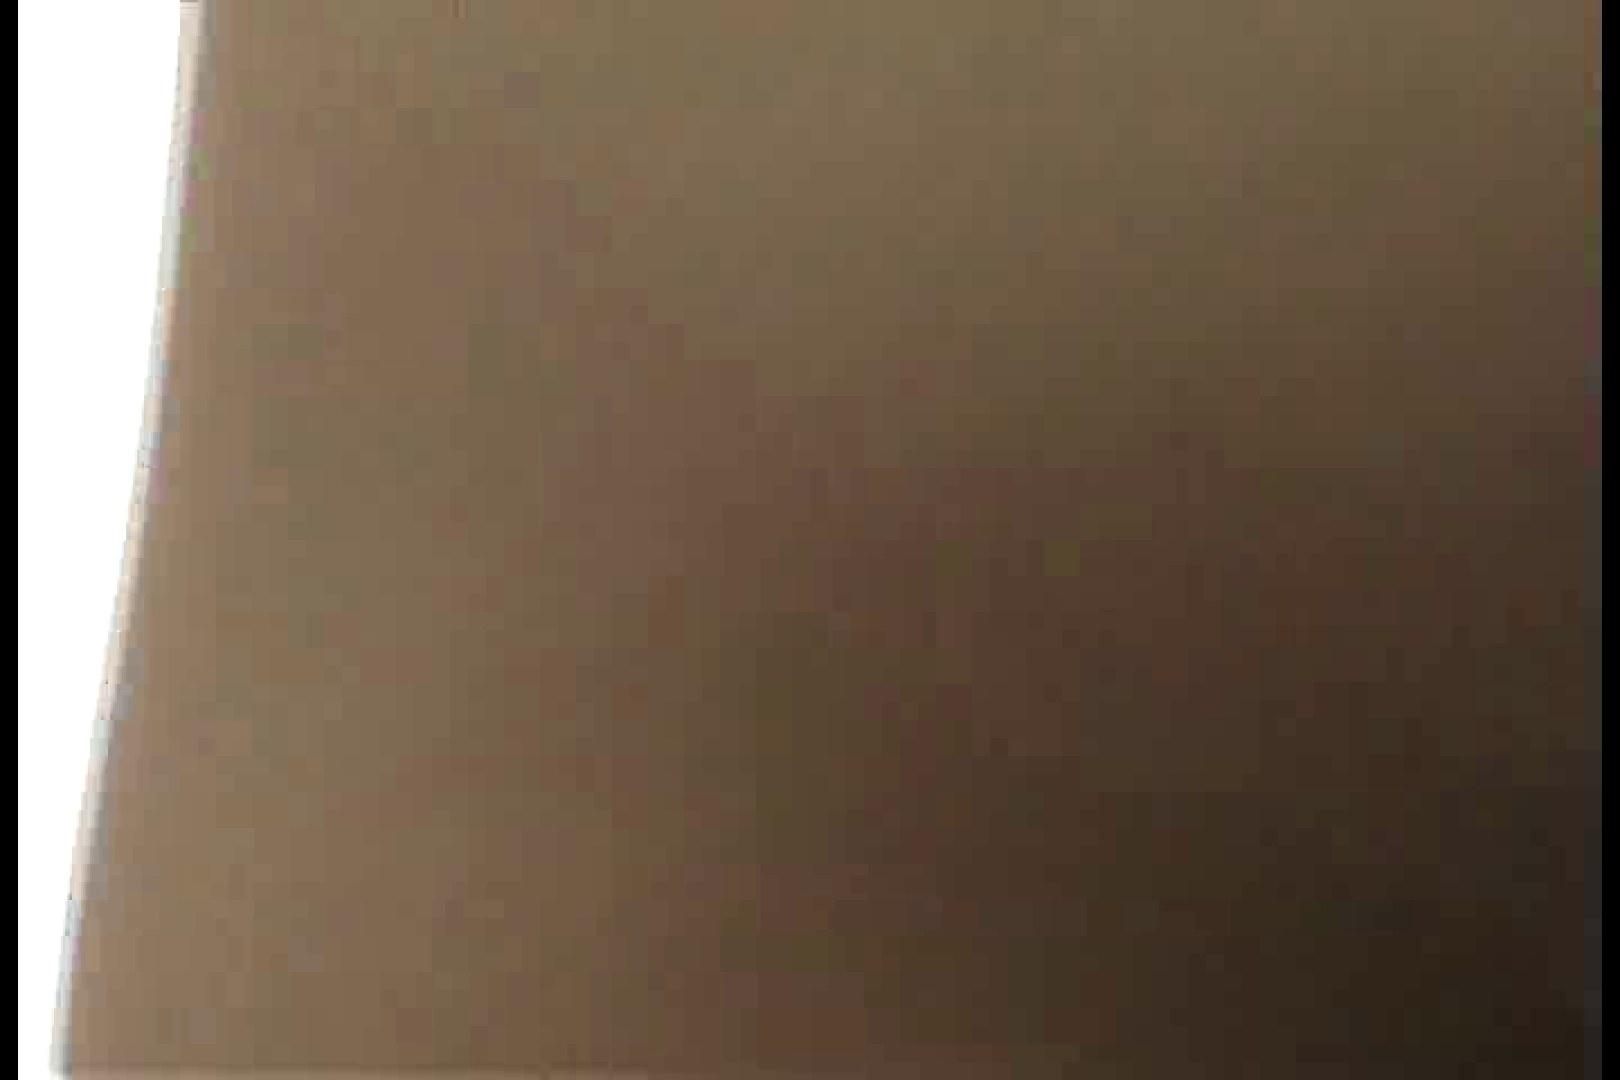 RQカメラ地獄Vol.4 レースクイーンエロ画像 | 股間満開  83PICs 25